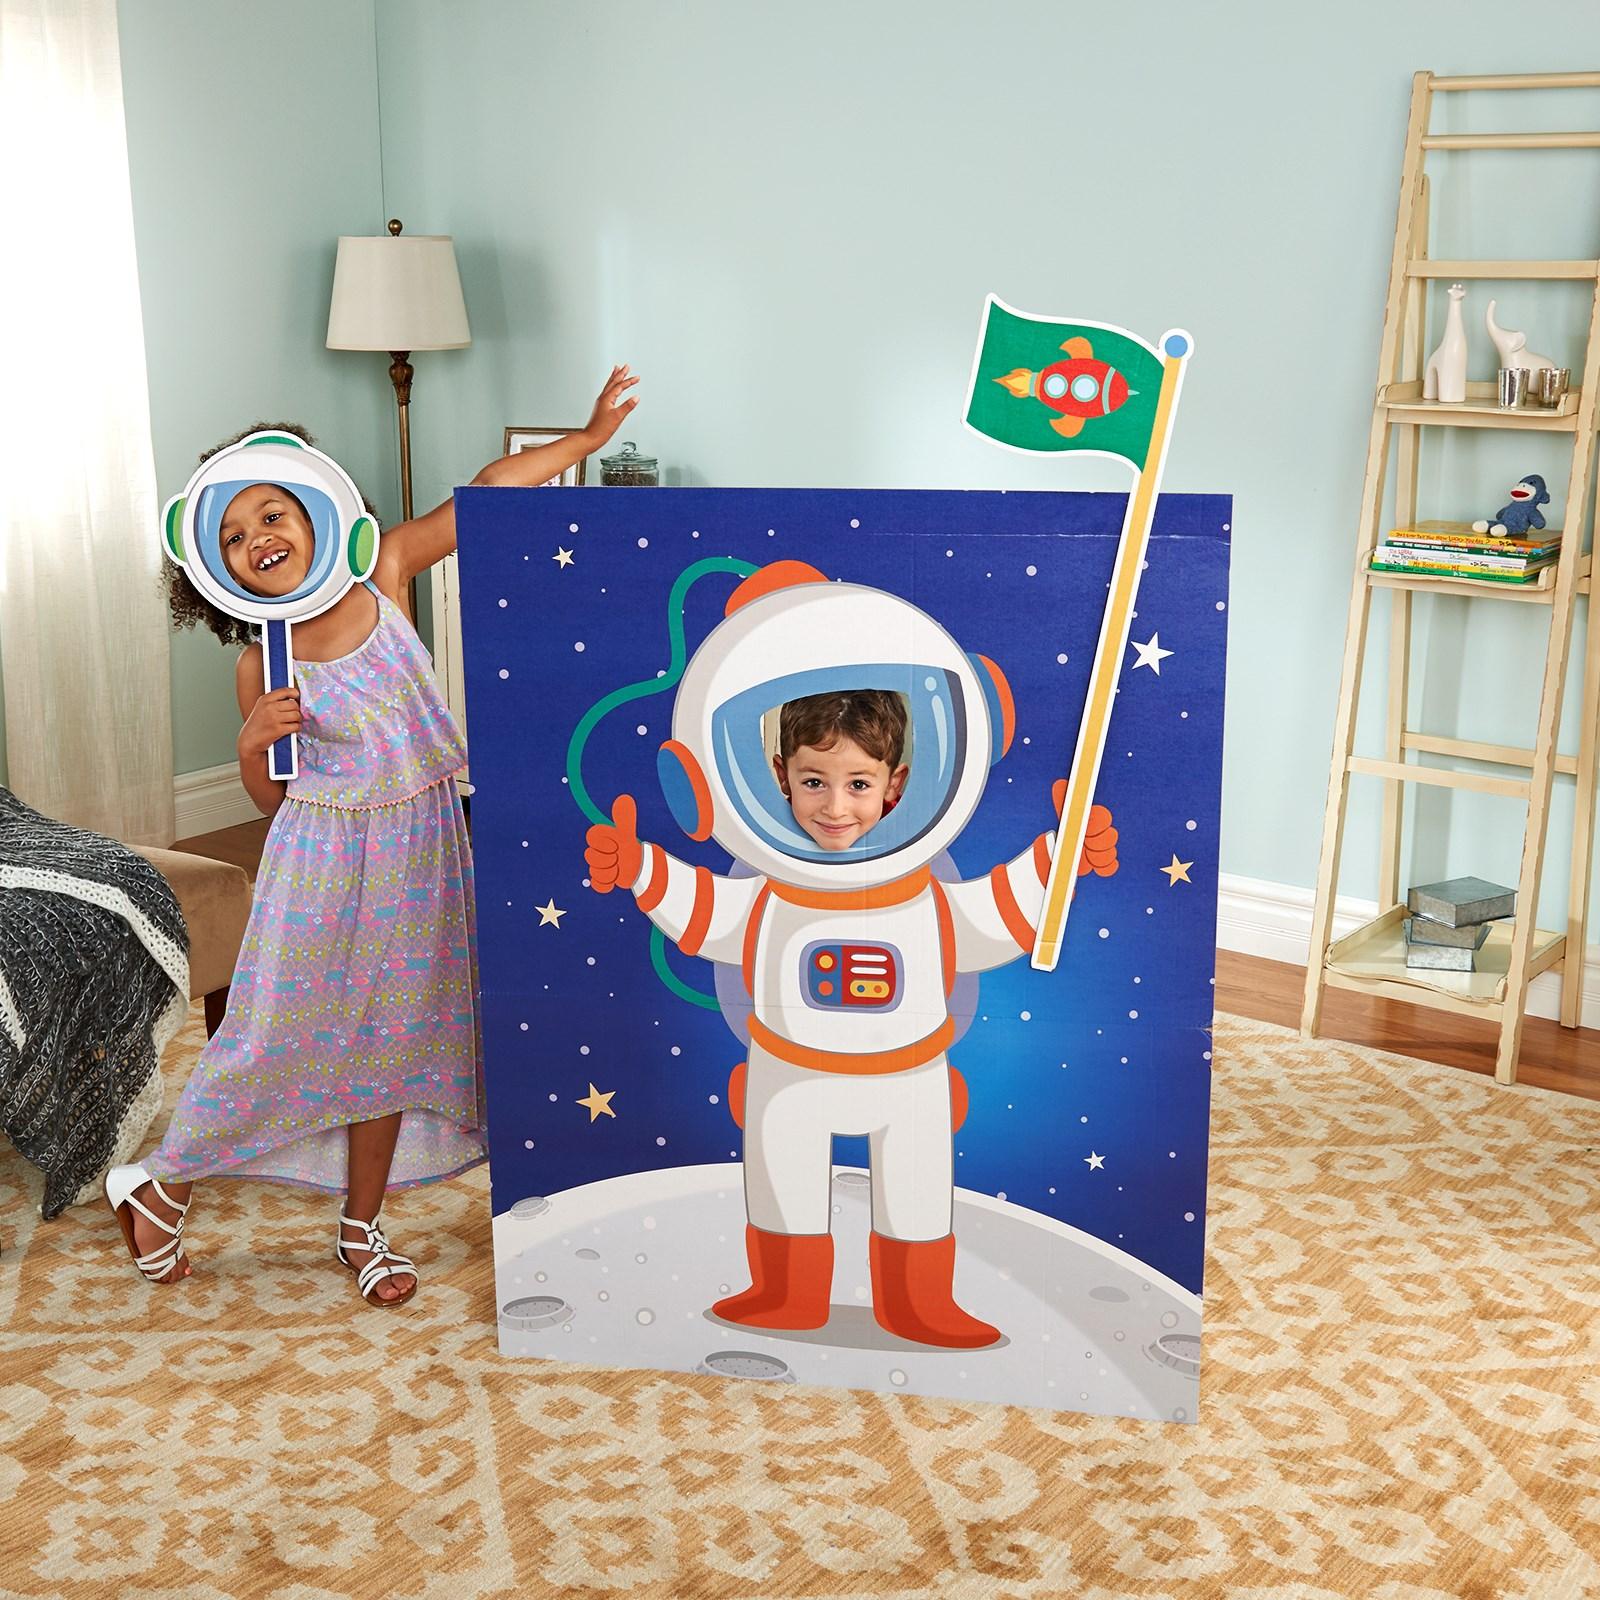 astronomy props - photo #48